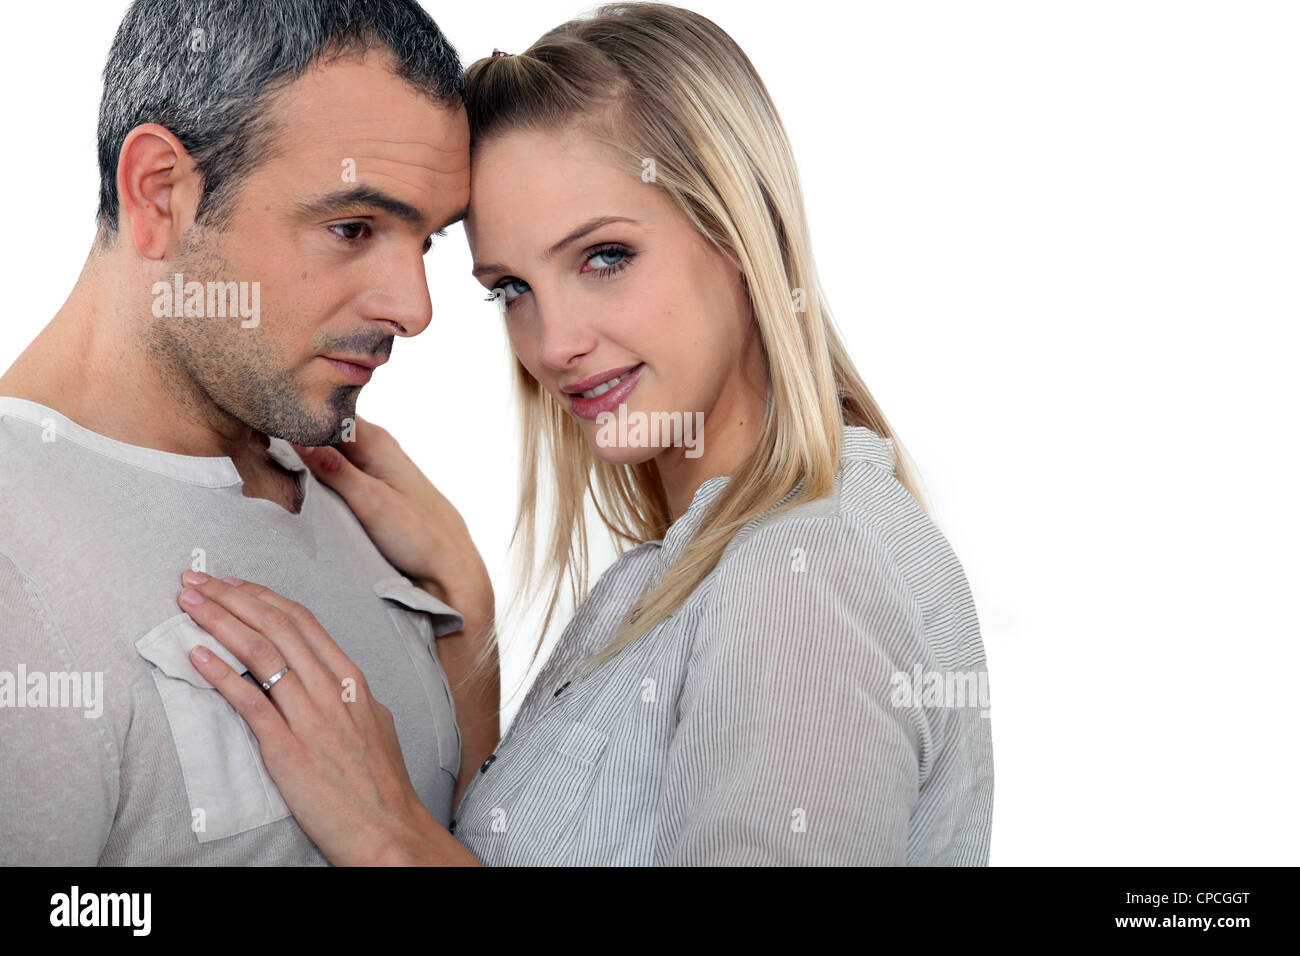 Couple embracing - Stock Image